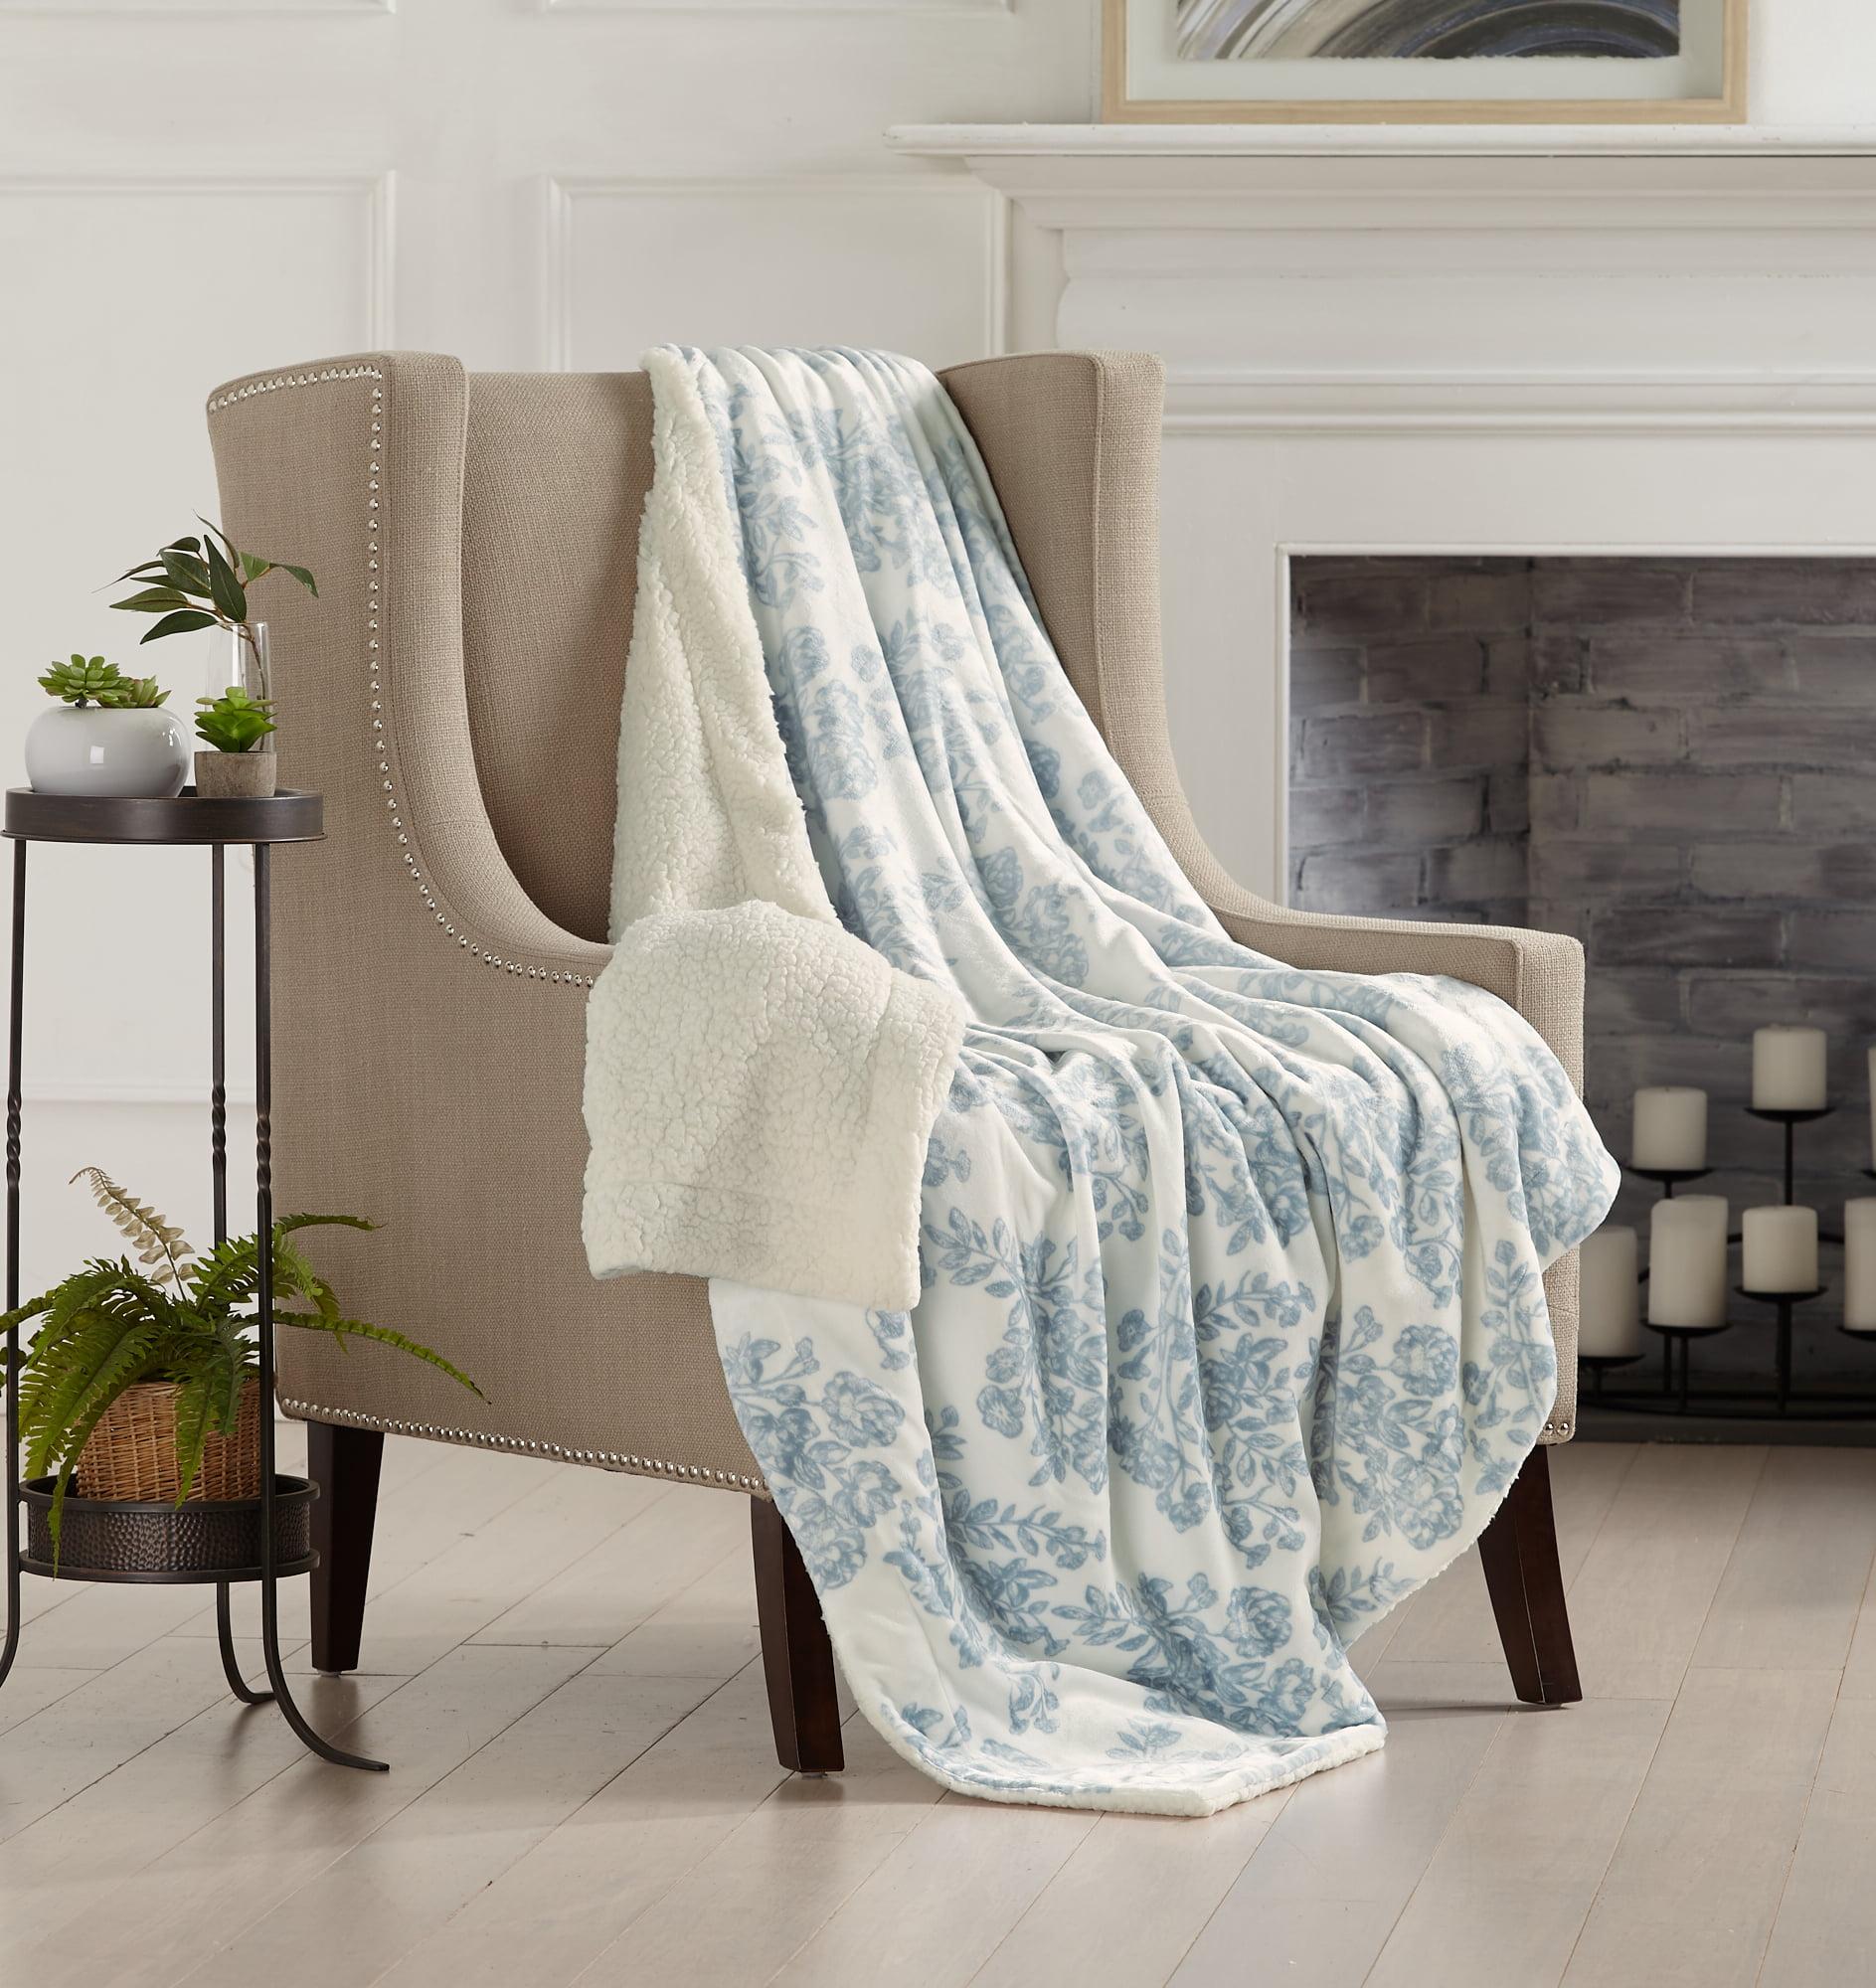 Home Fashion Designs Reversible Berber And Sculpted Velvet Plush Bed Blanket Walmart Com Walmart Com